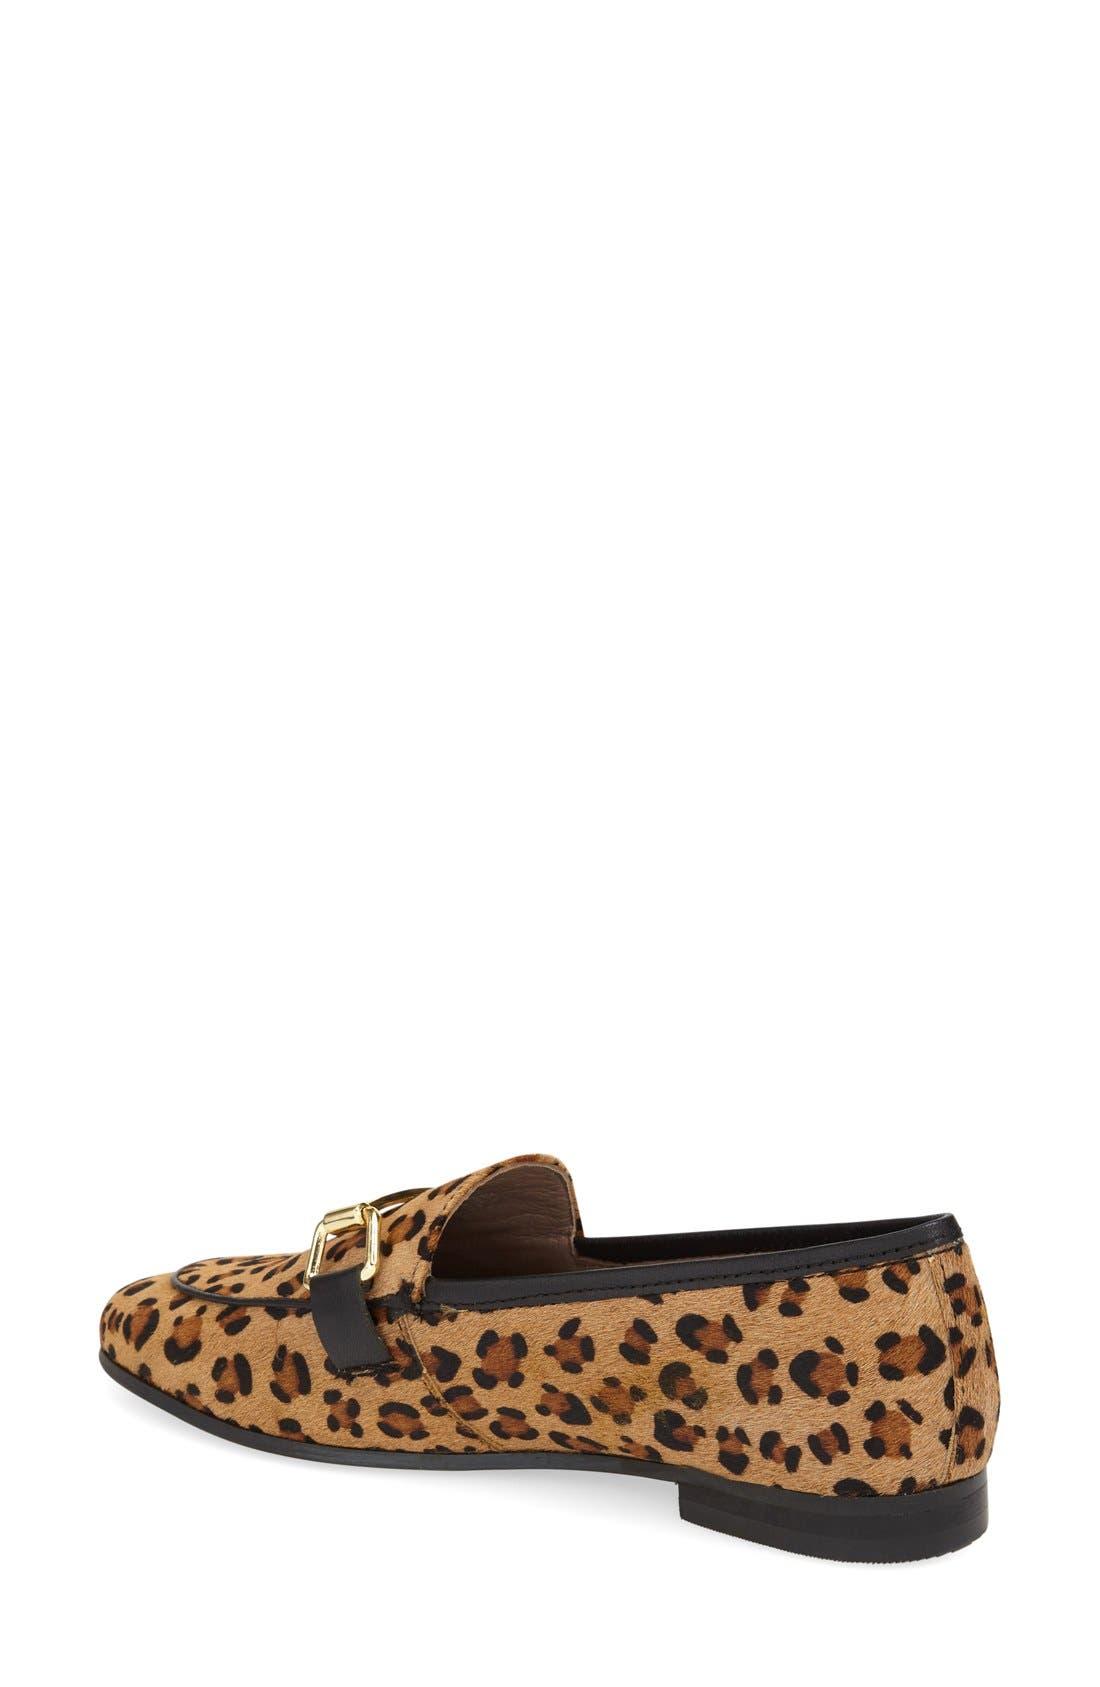 Alternate Image 2  - Topshop 'Kendall' Genuine Calf Hair Loafer (Women)